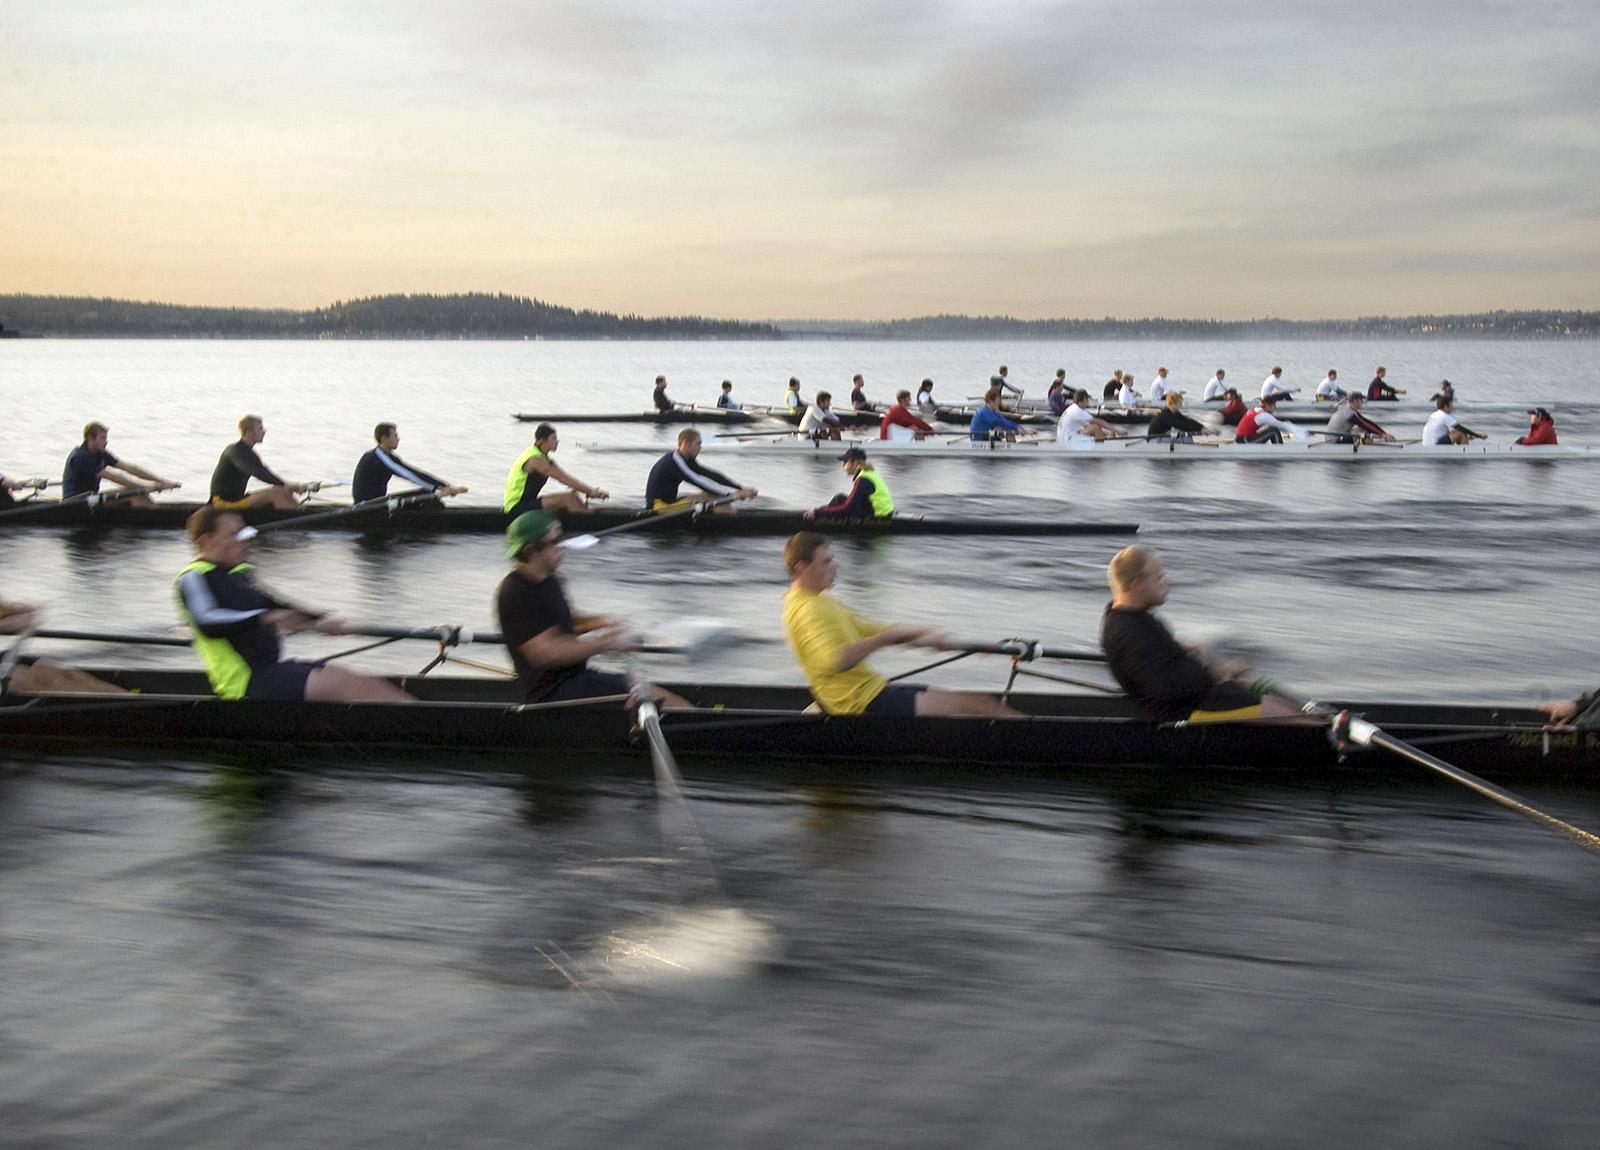 University of Washington rowing team